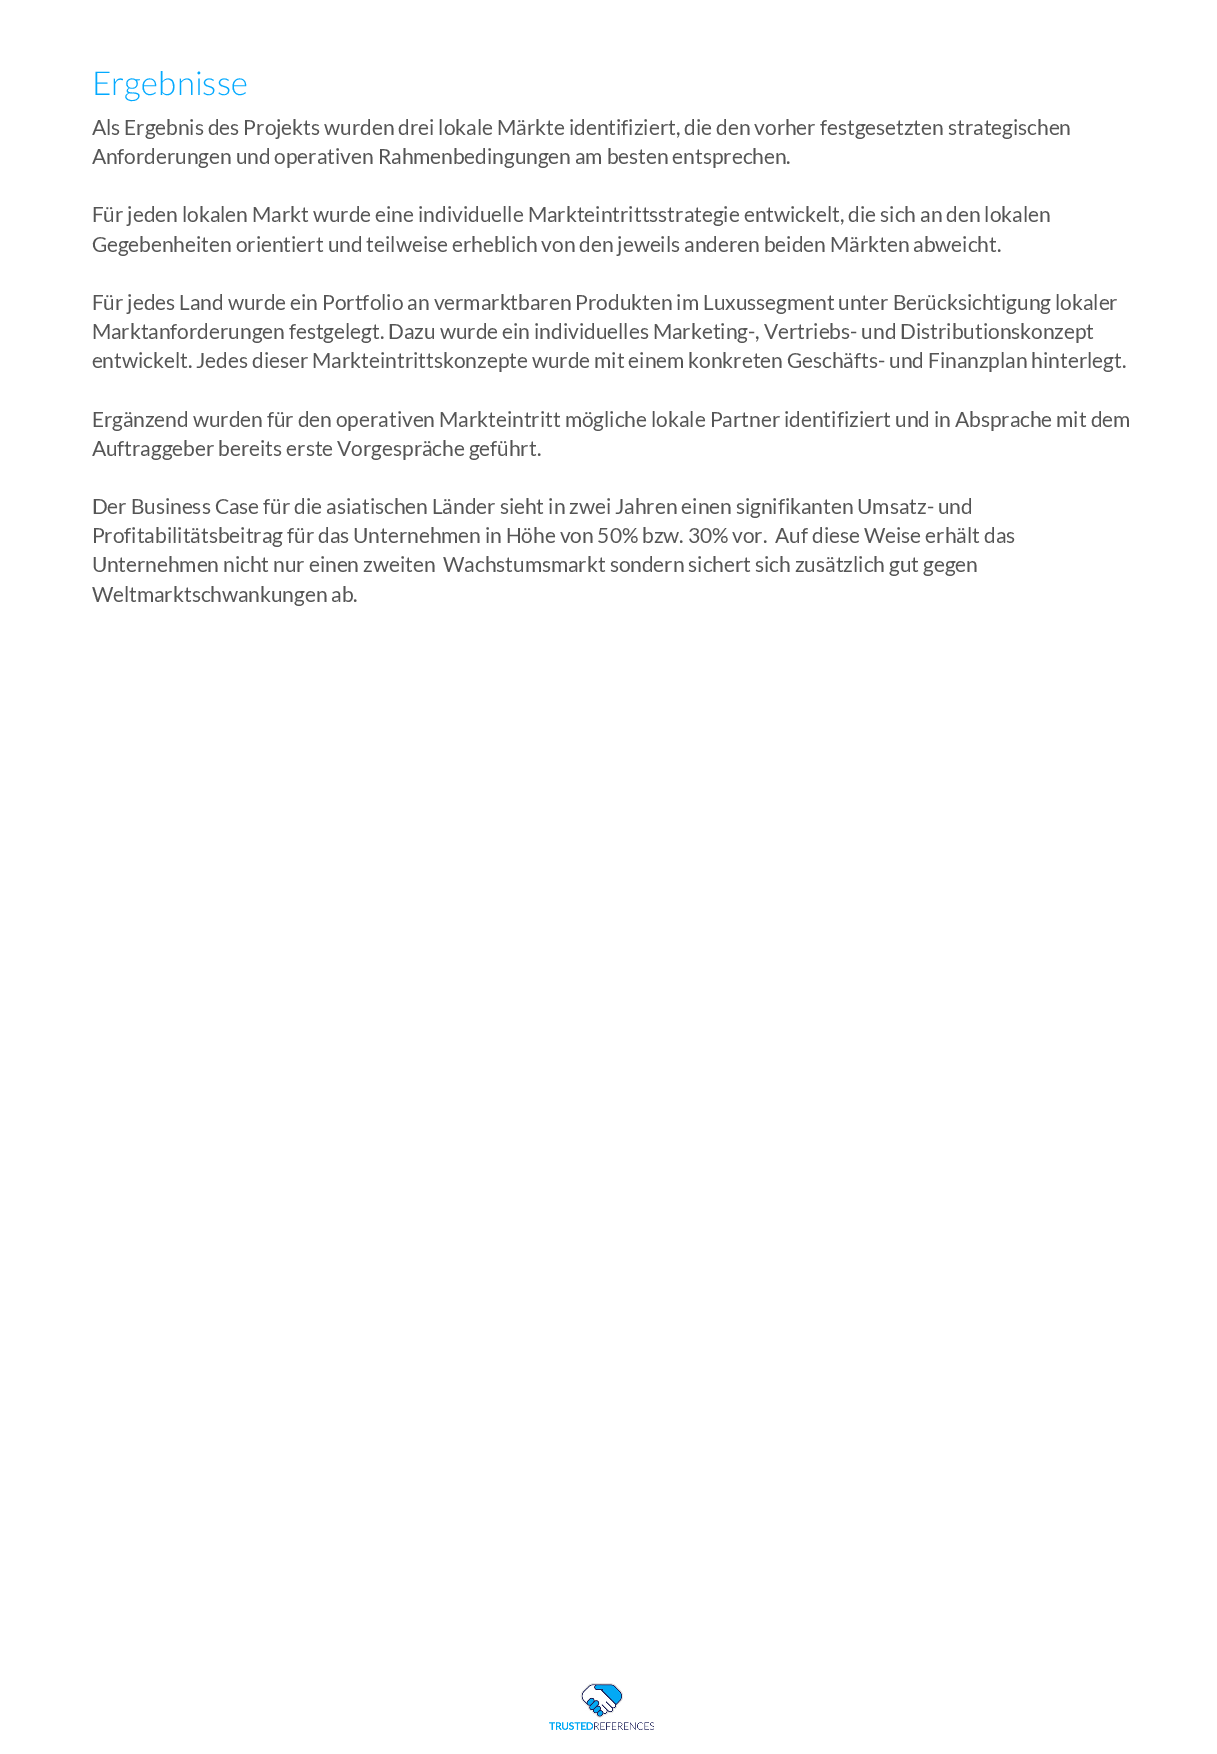 4 Case Study_B2B_Content_Marketing_Referenzmarketing_Trusted_References 3